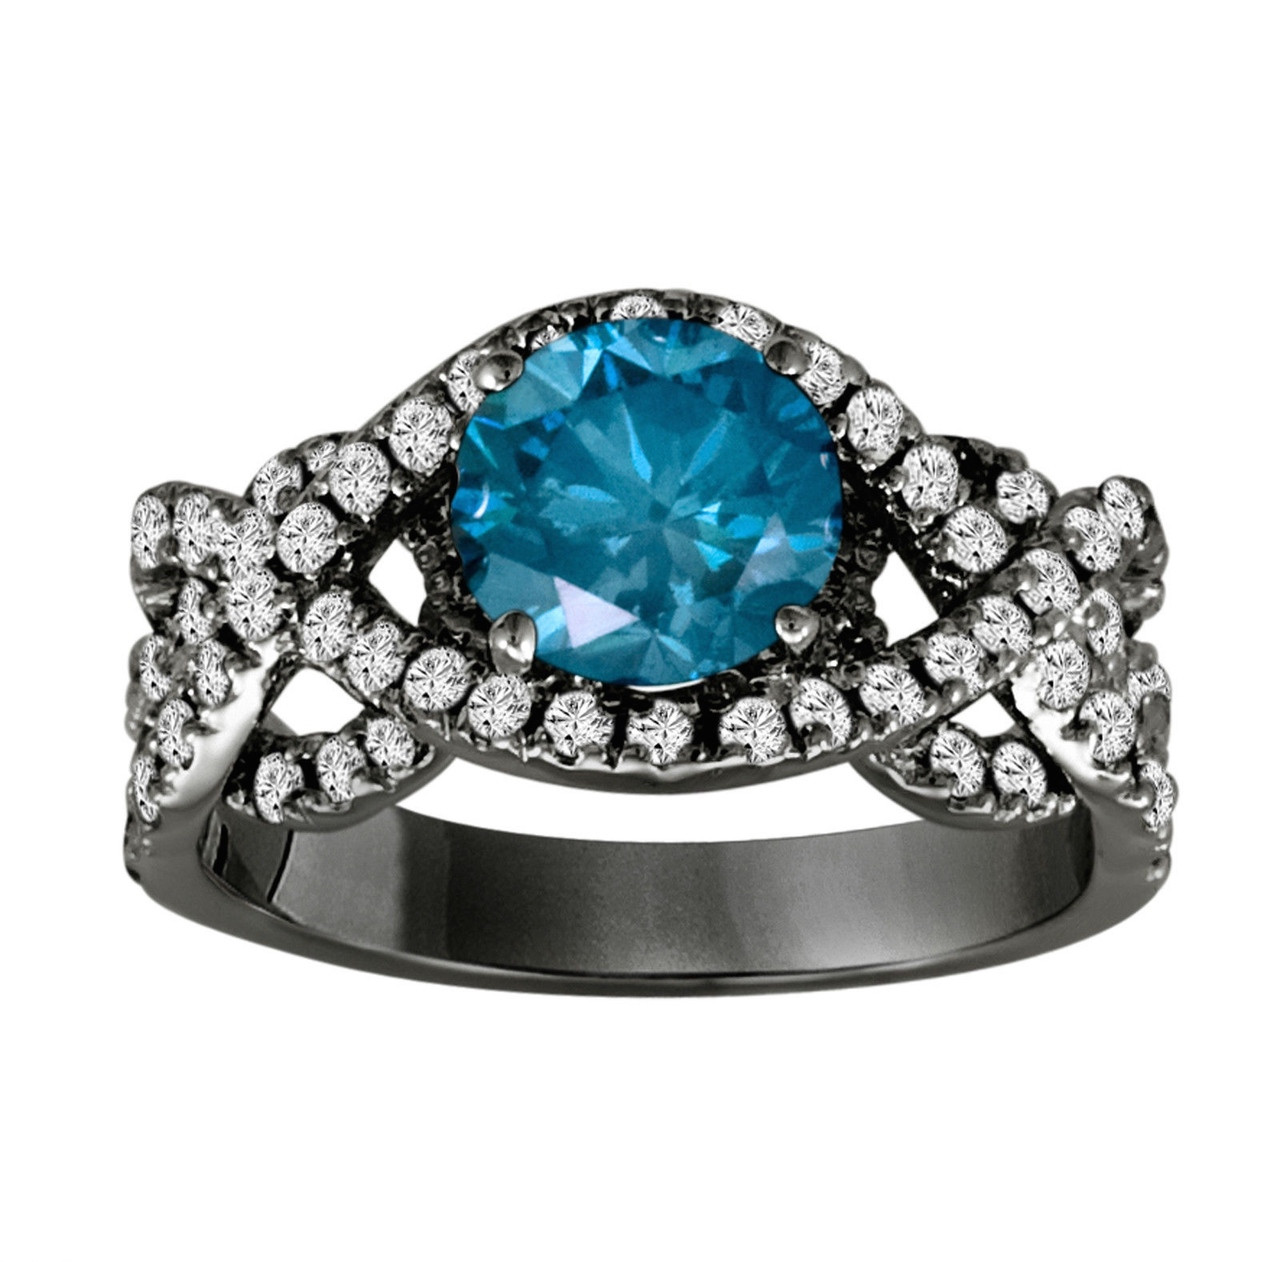 Fancy Blue Diamond Engagement Ring 14k Black Gold Vintage Style 1 90 Carat Certified Unique Handmade